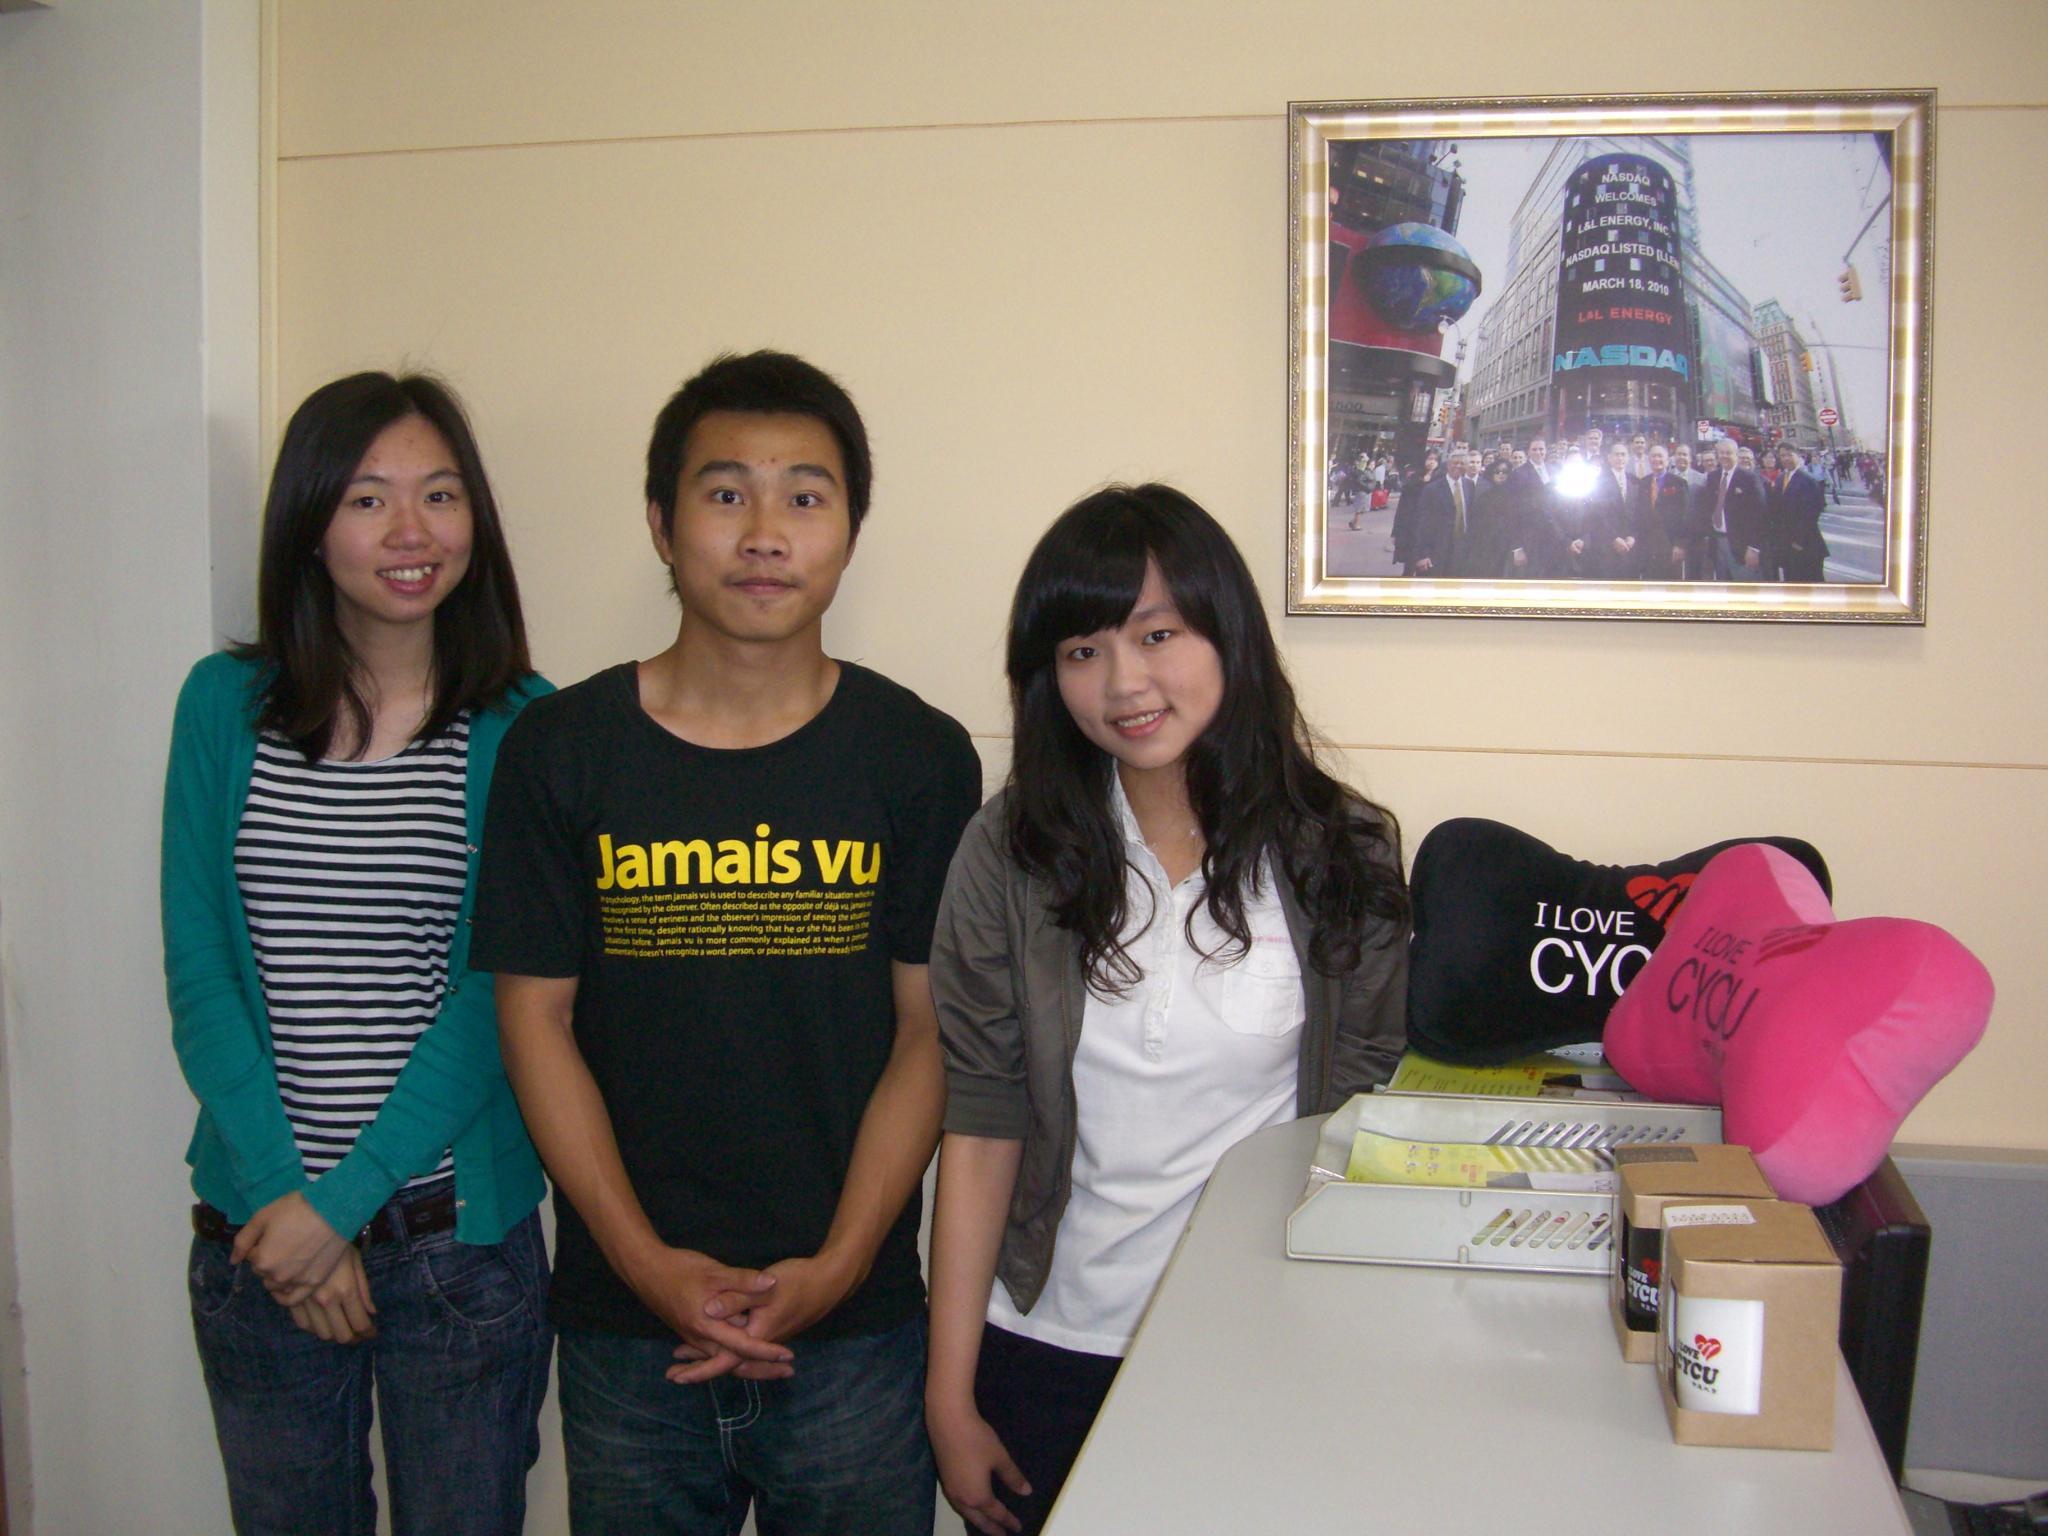 L&L暑期海外實習計劃 擴展學生國際視野